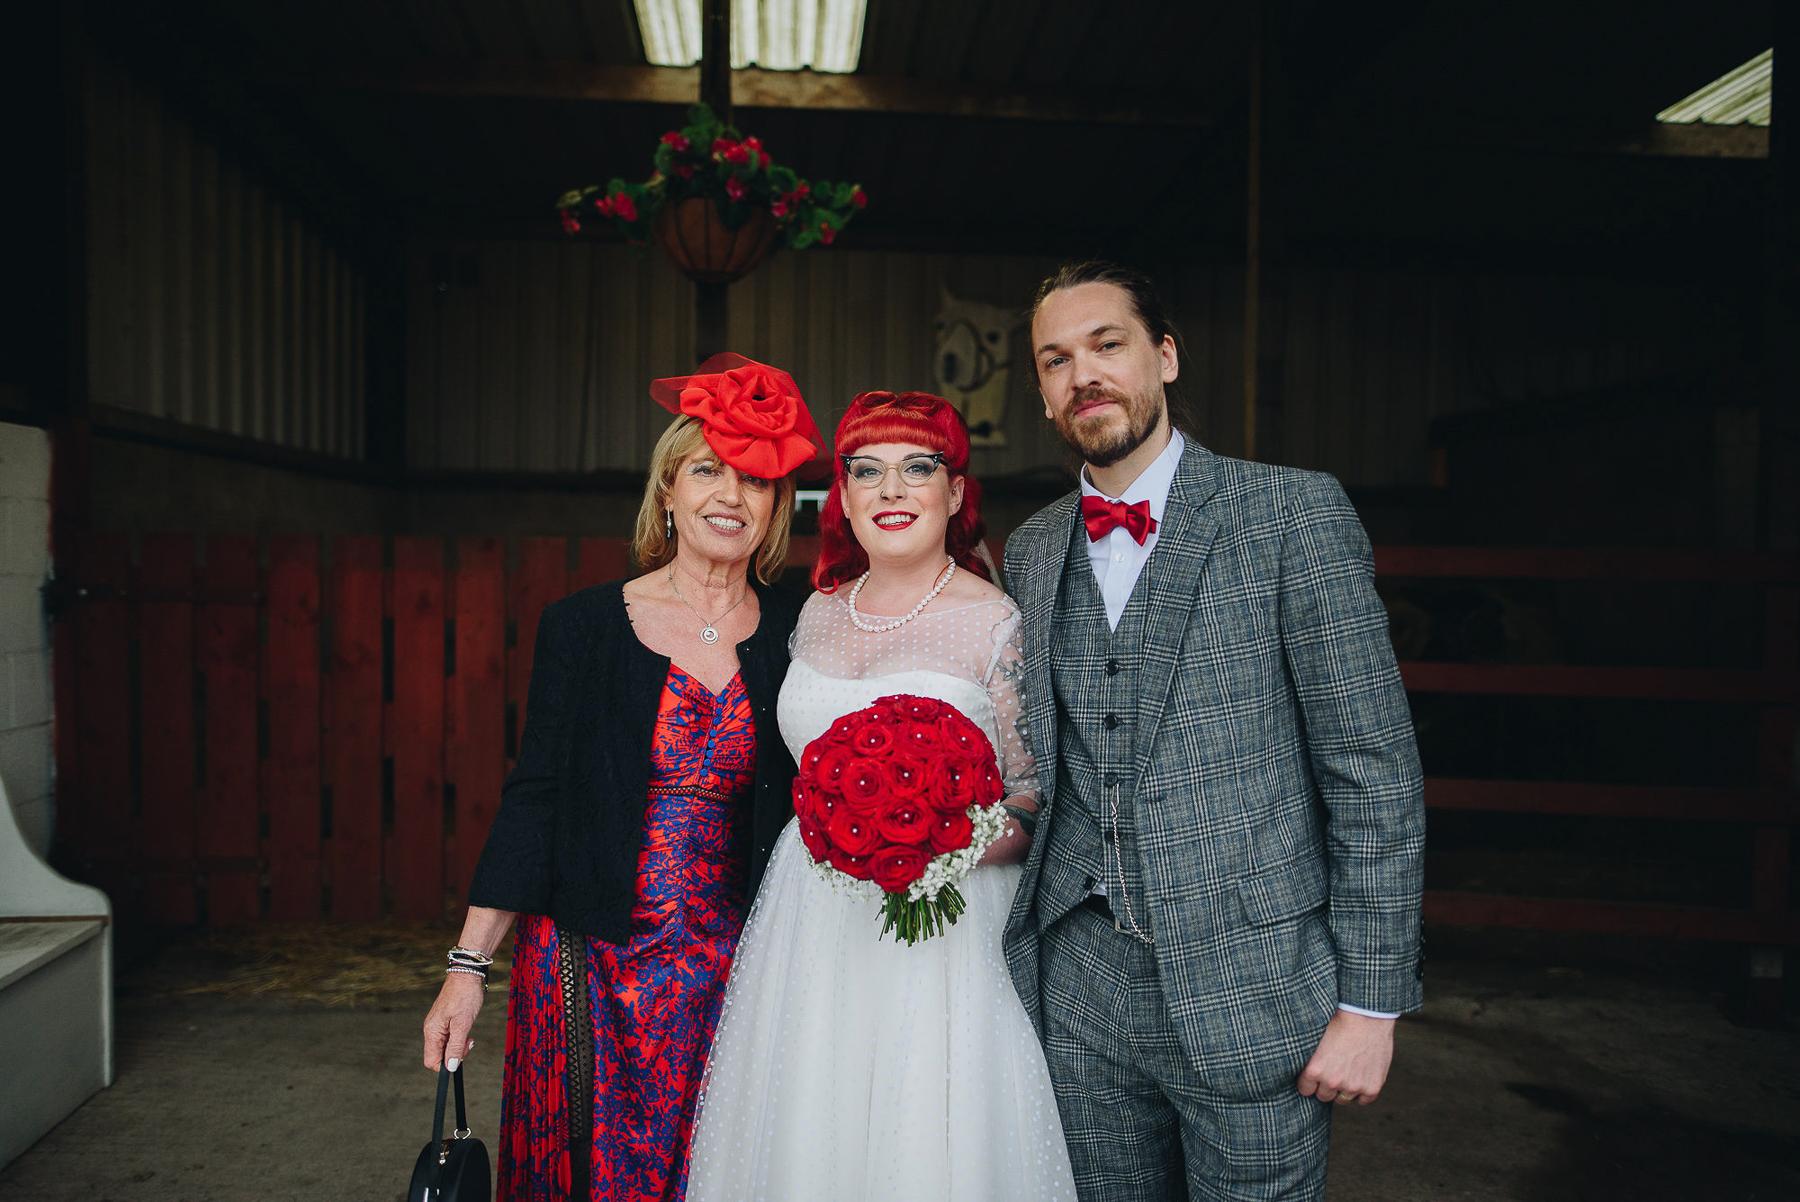 Wellbeing_Farm_Wedding_Photography_The_Pin-Up_Bride_Lara_Shaun-83.jpg